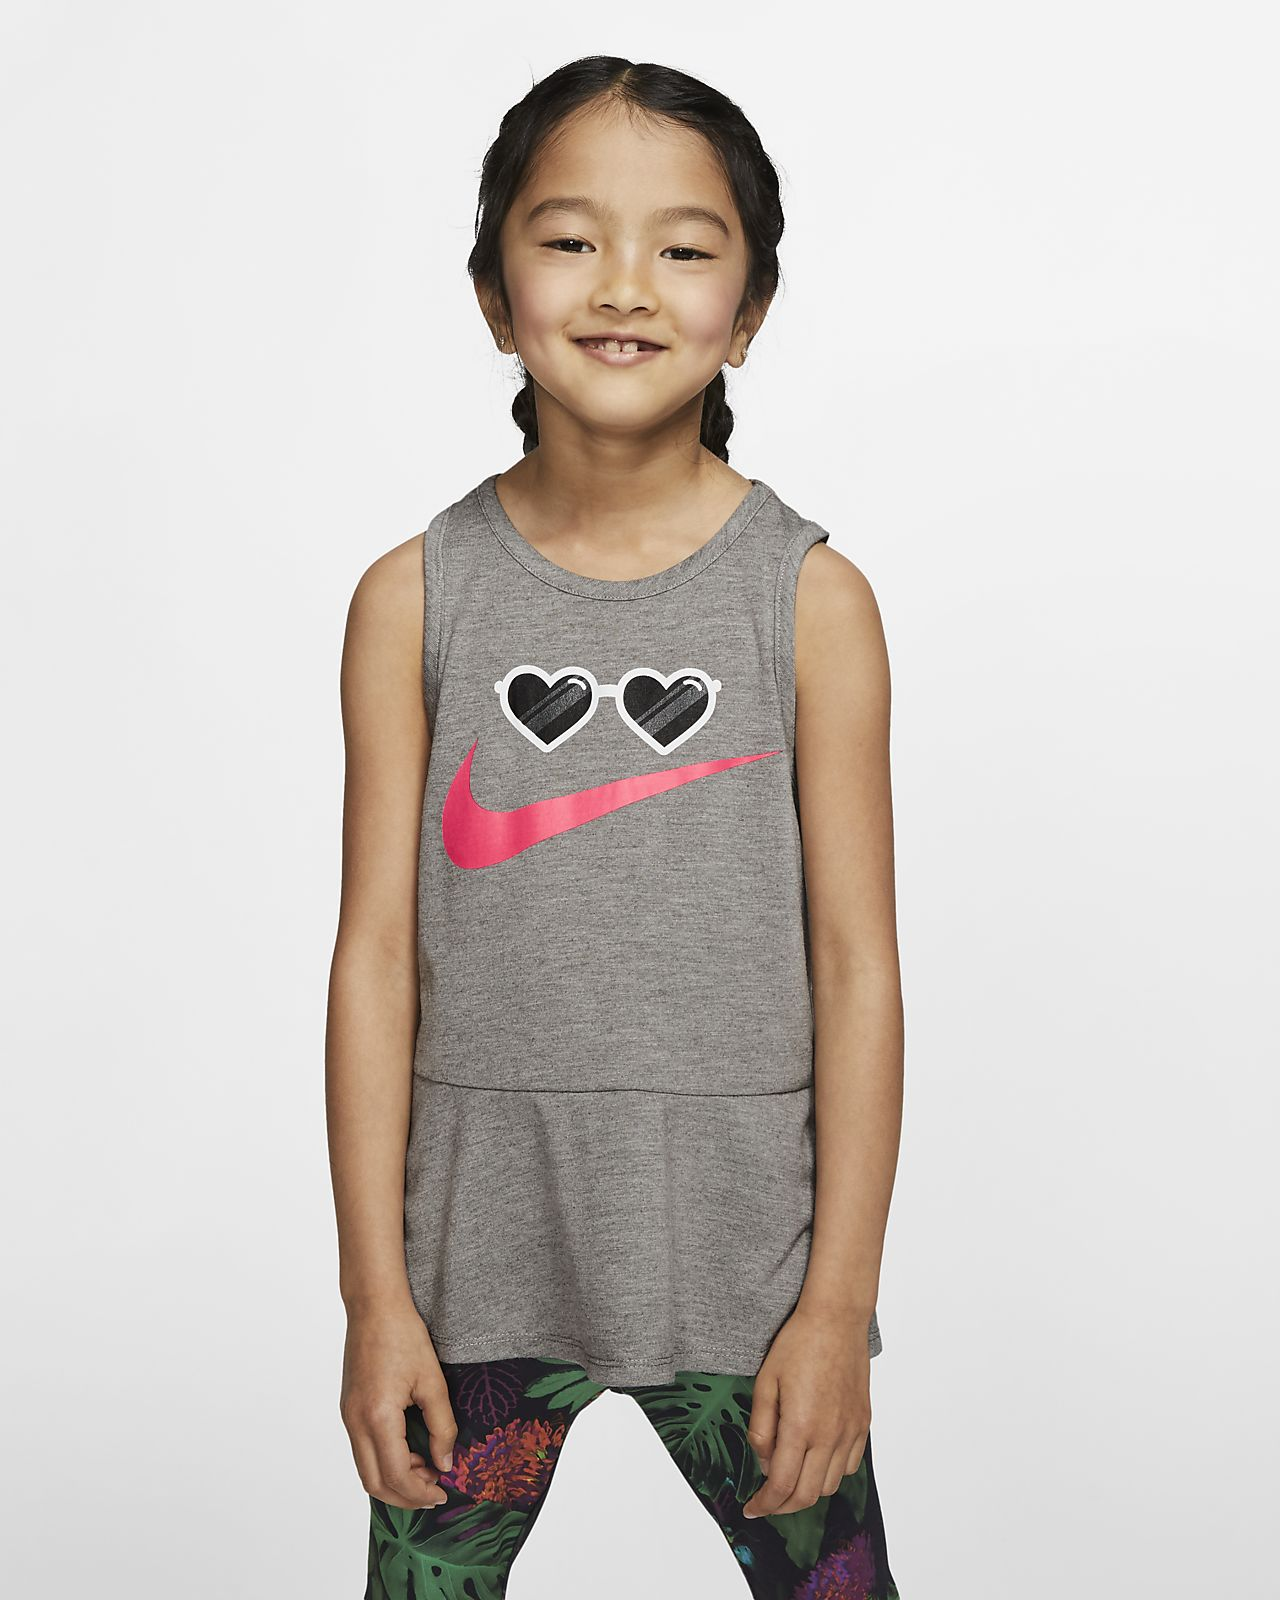 Nike 幼童无袖上衣